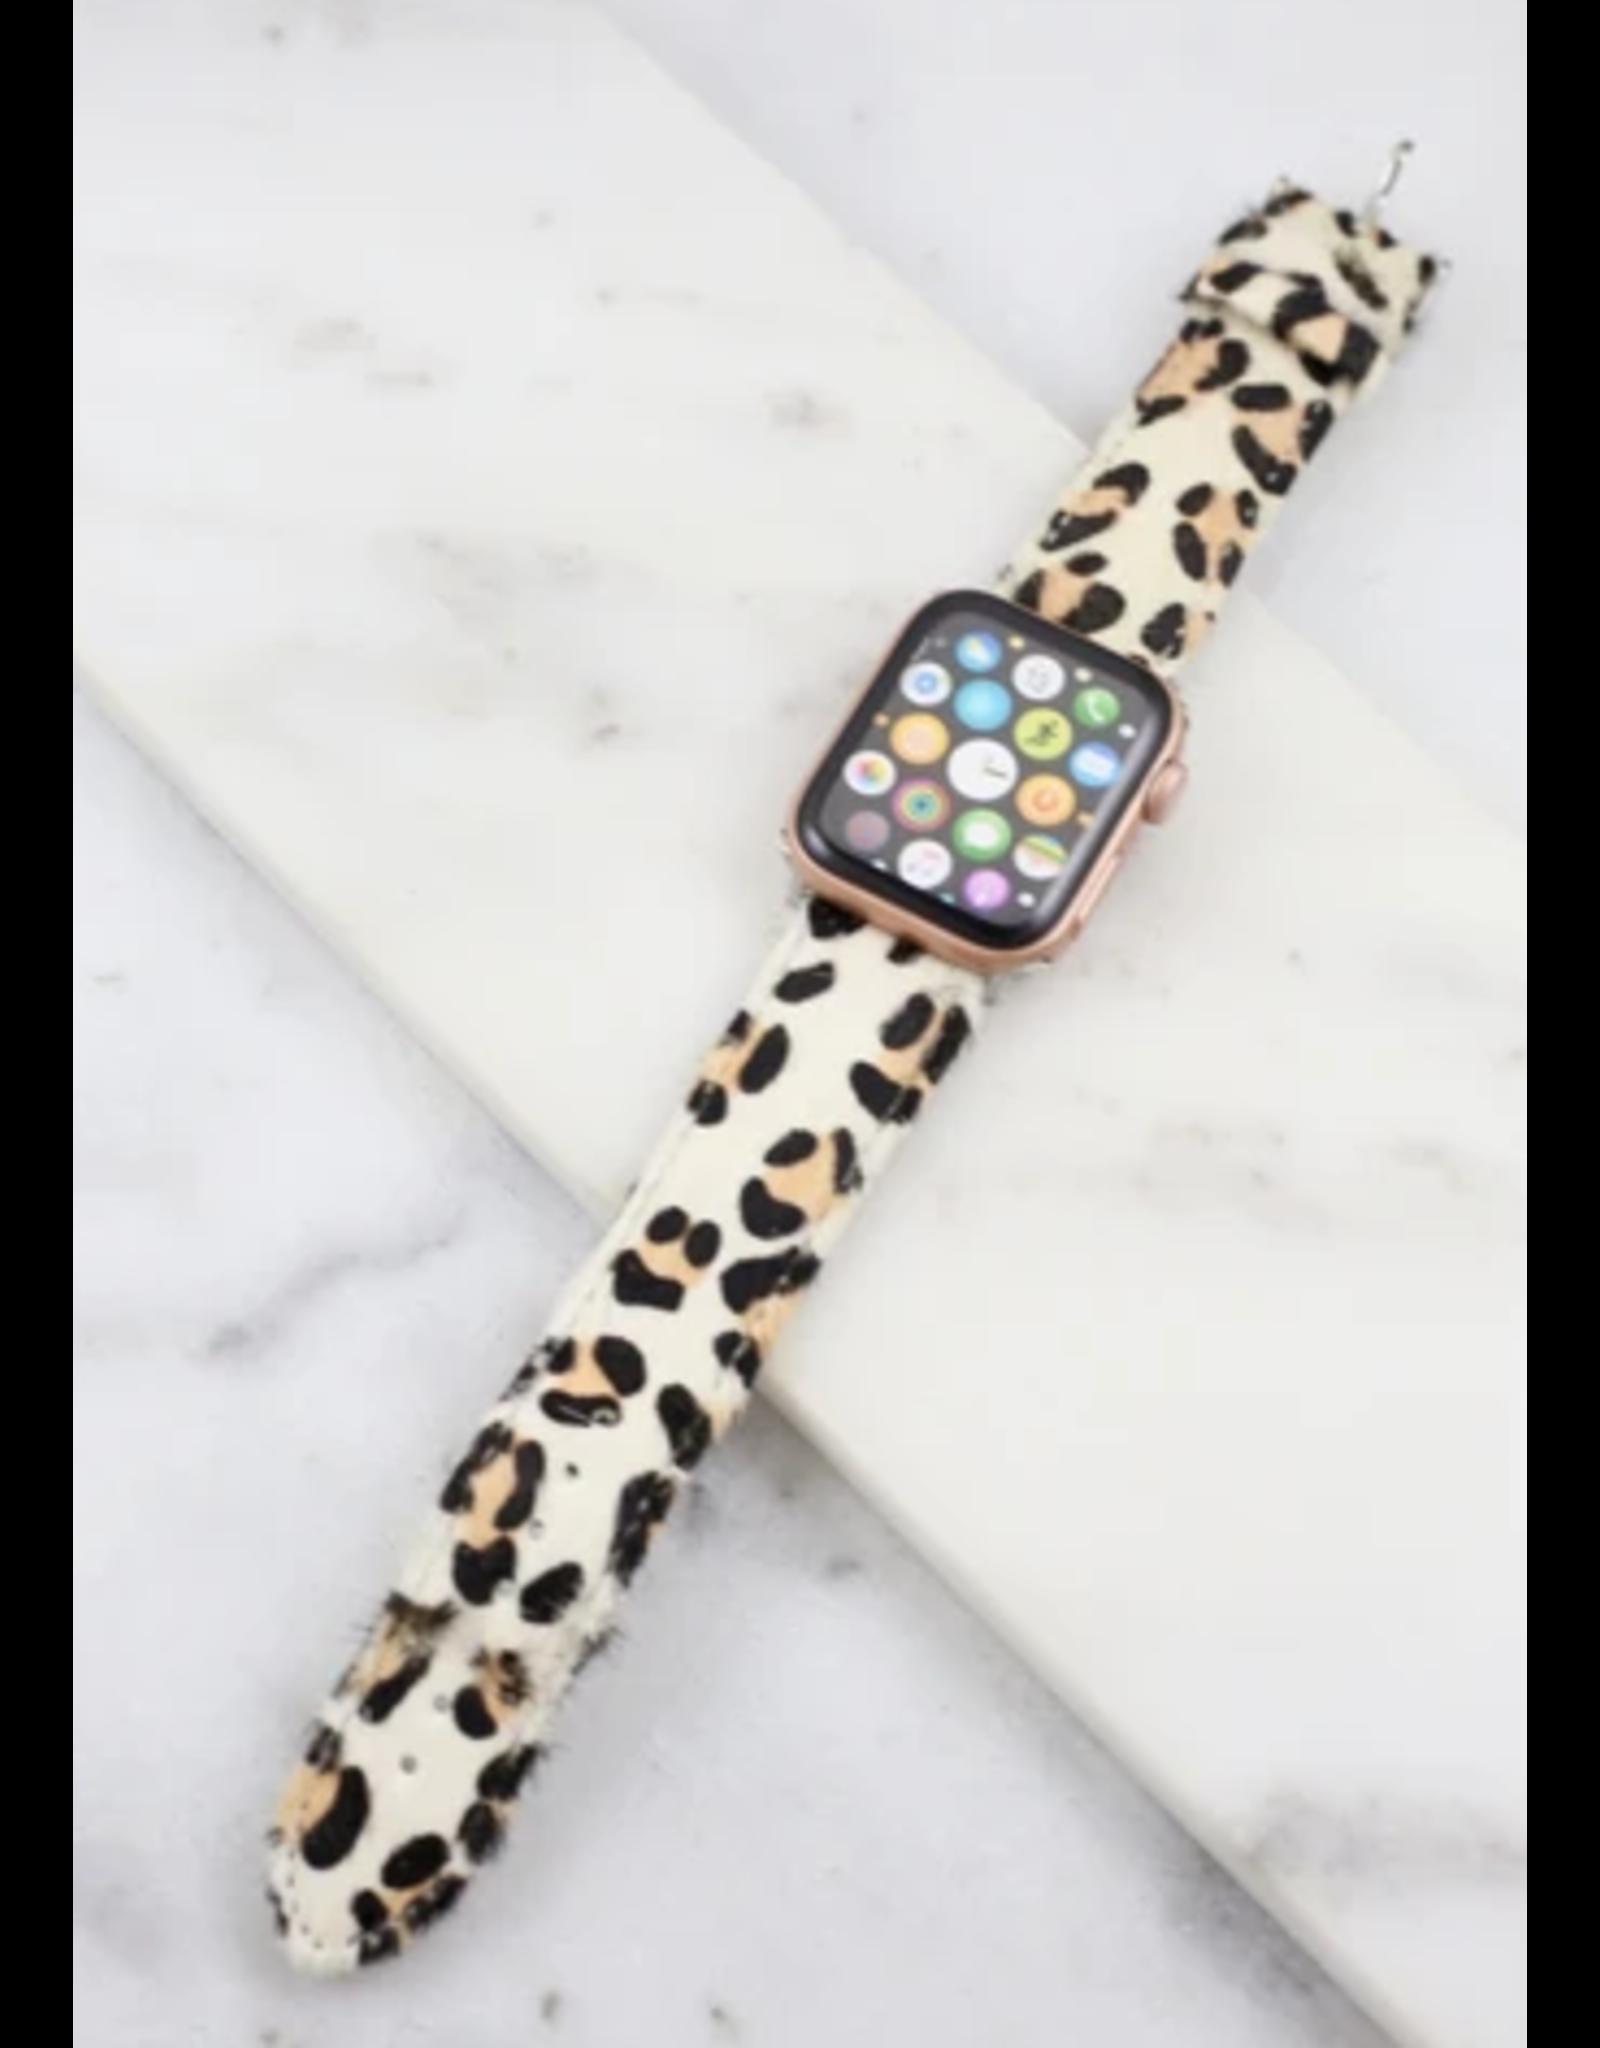 42mm Leopard Apple Watch Band